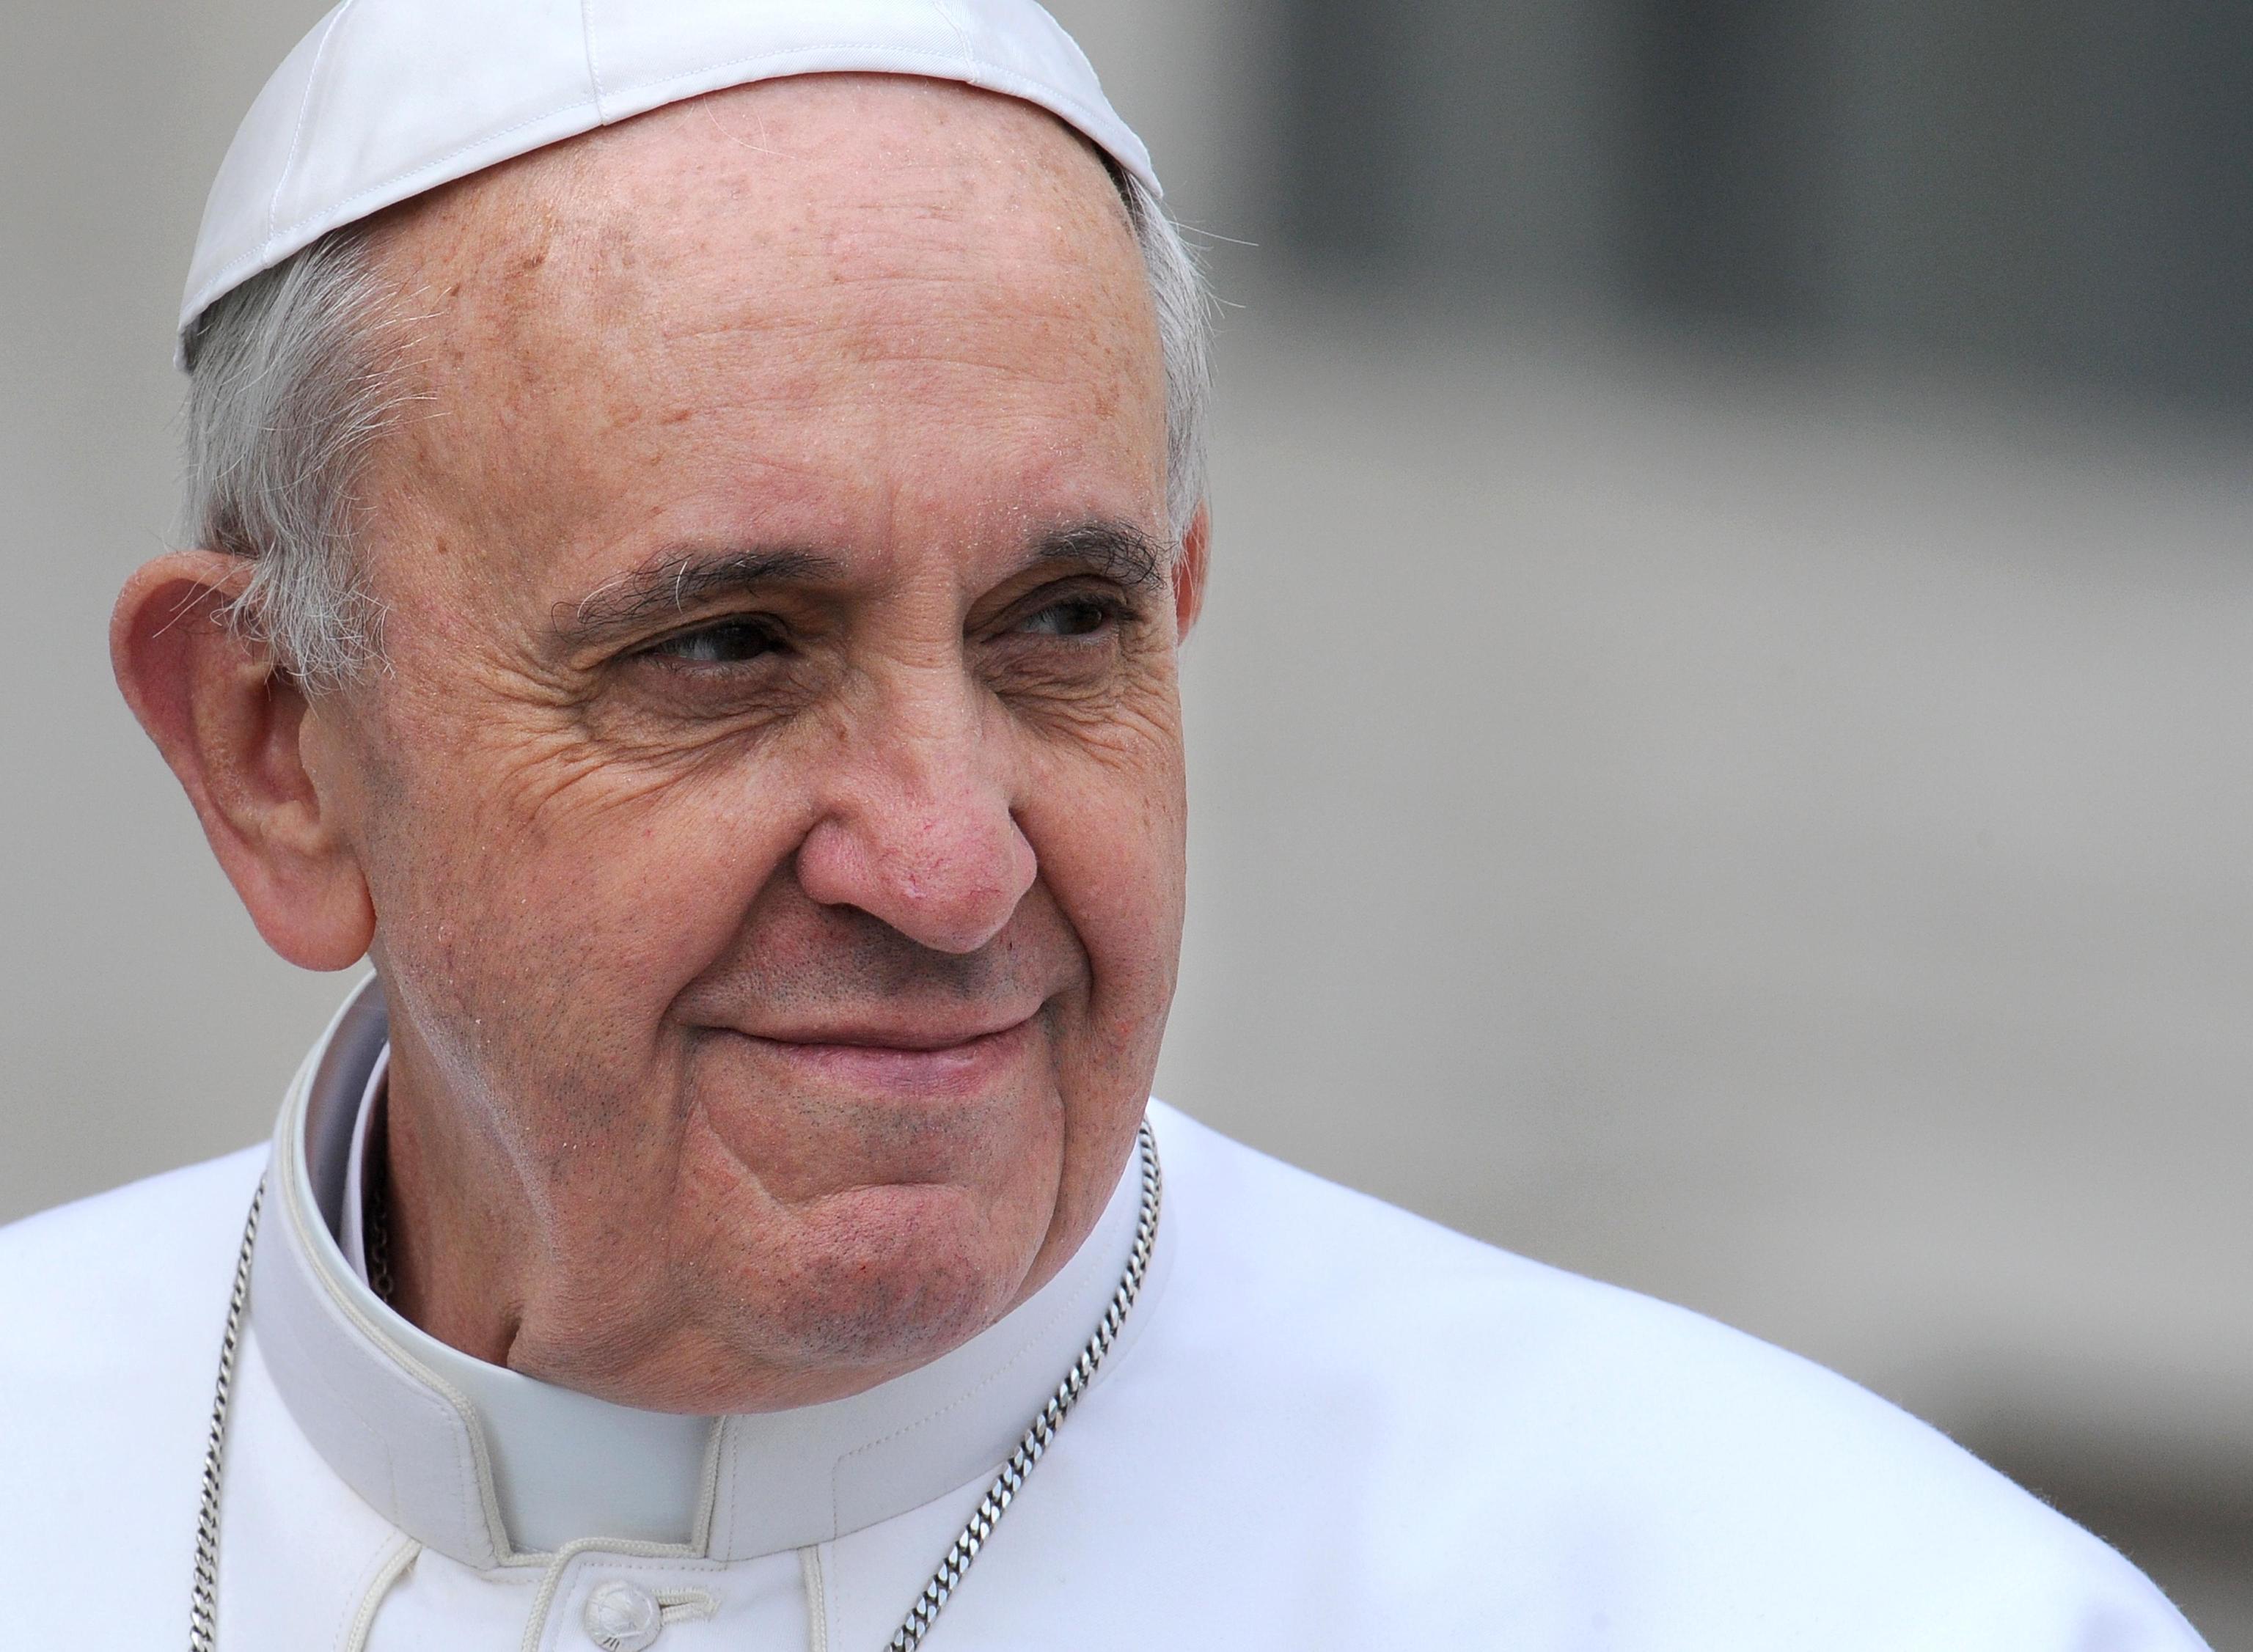 ansa – braghieri – POPE: GENERAL AUDIENCE